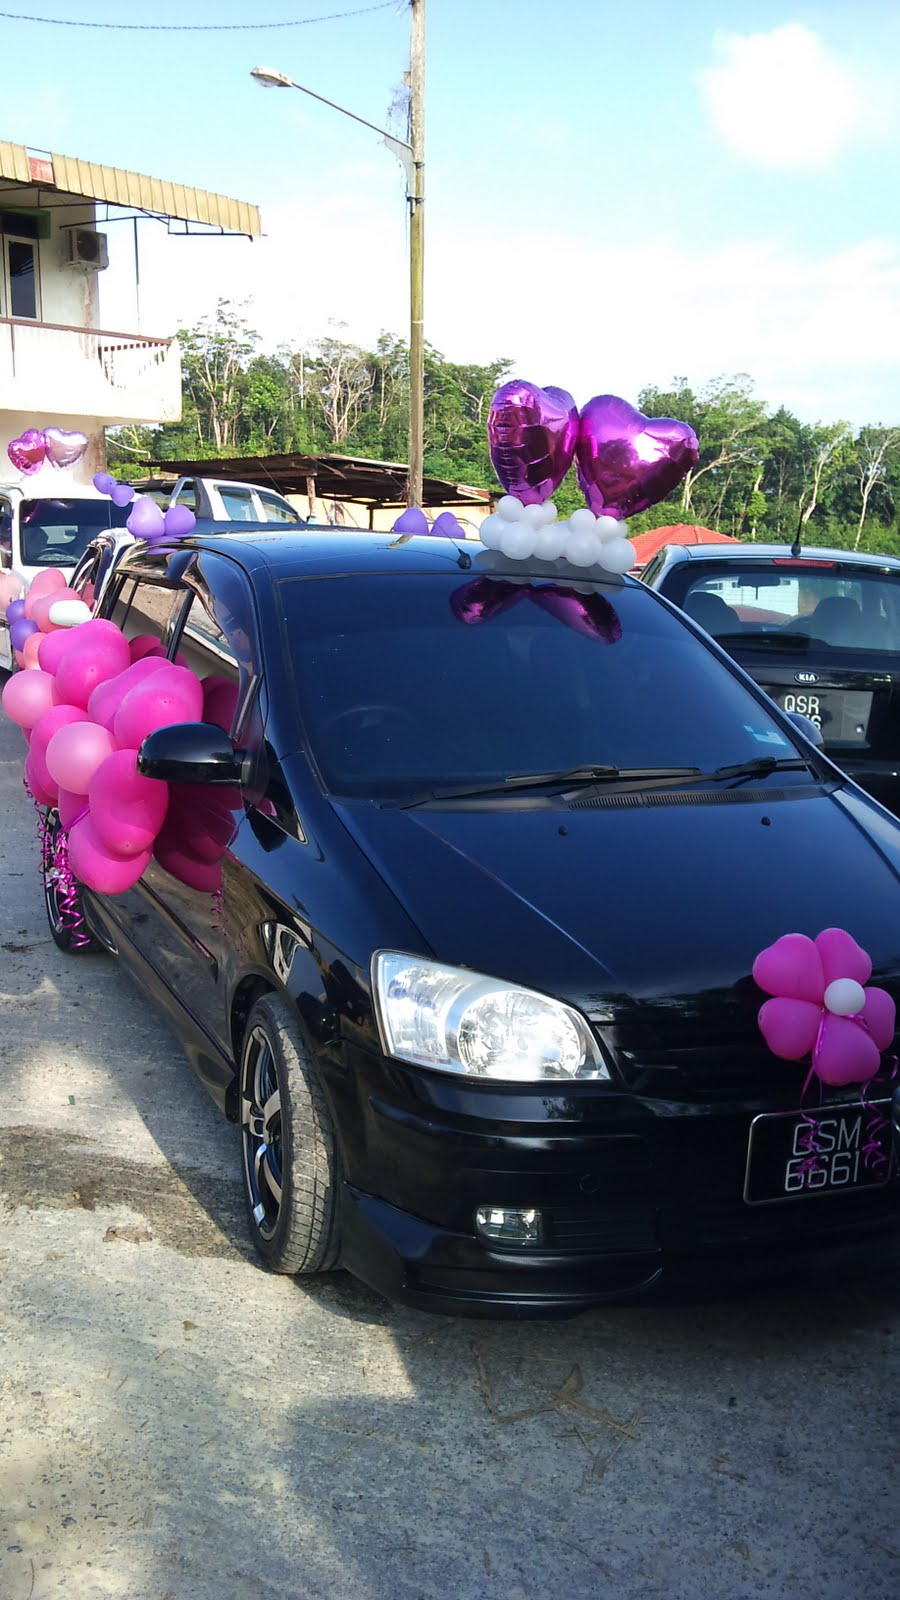 Balloon Decorations For Weddings Birthday Parties Sculptures In Kuching And Miri Sarawak Wedding Car Decoration Peter Su Big Day